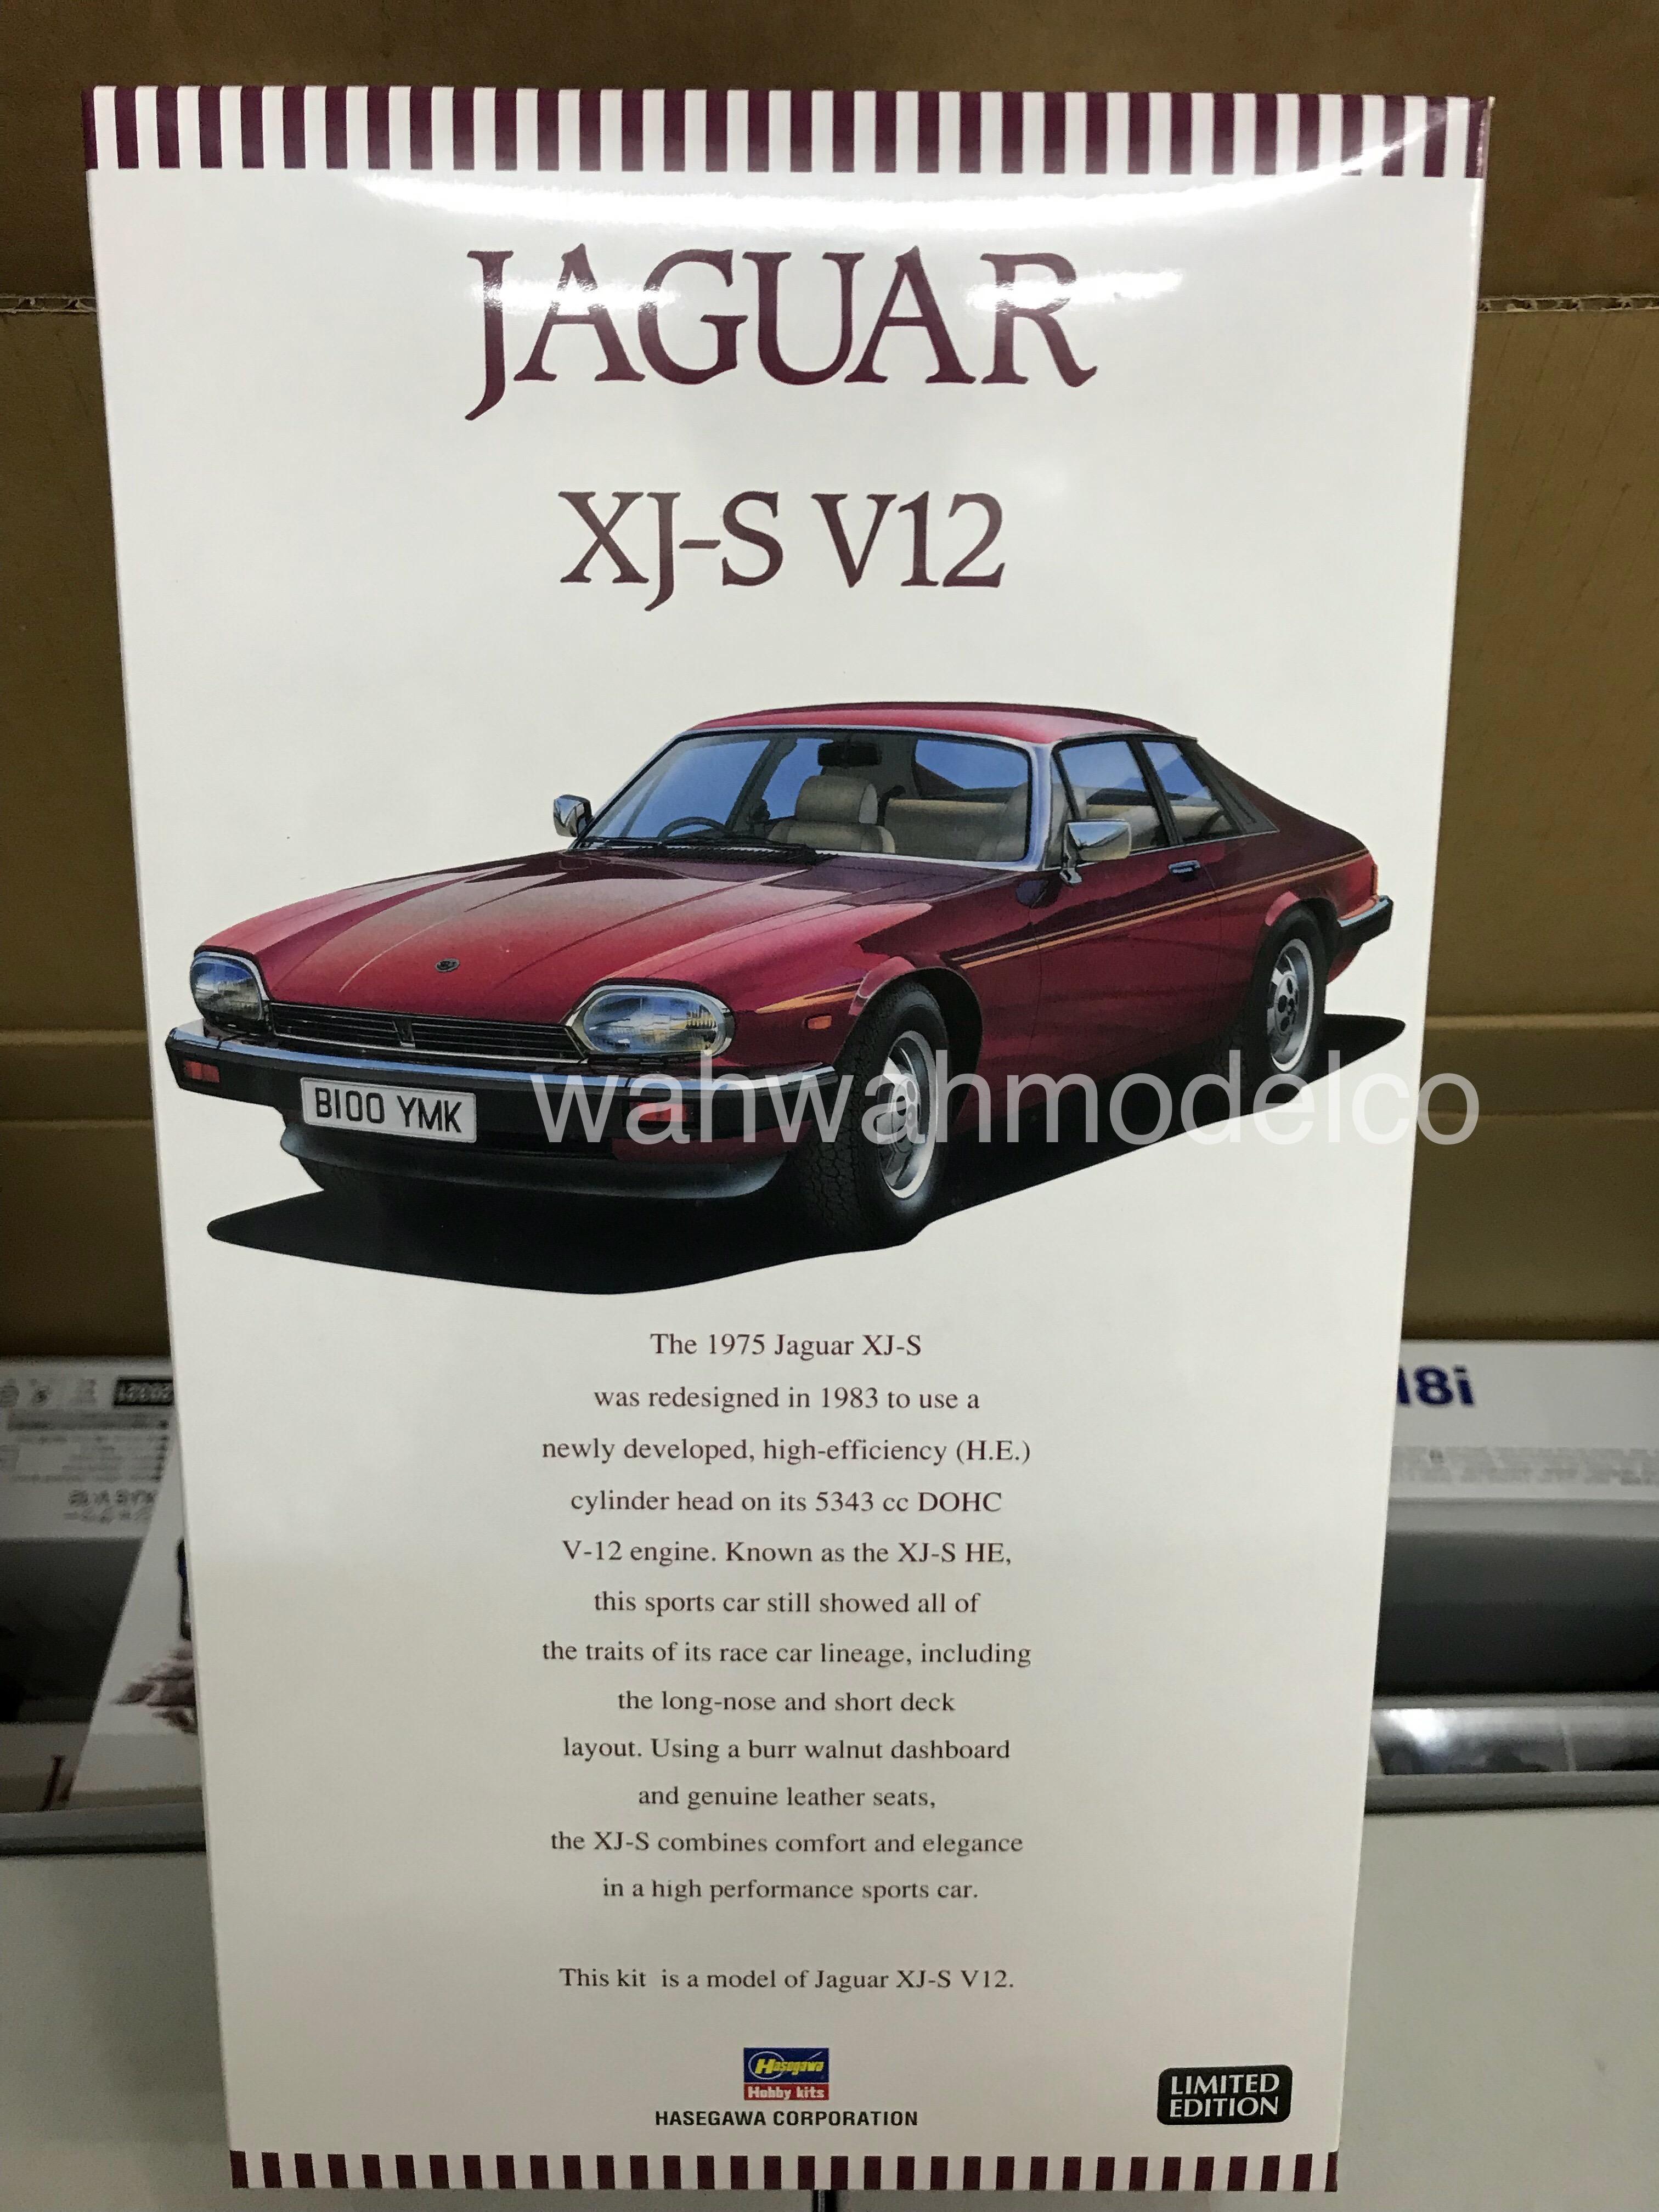 Hasegawa Jaguar XJ-S V12 20321 1/24 Scale Plastic Model Kit